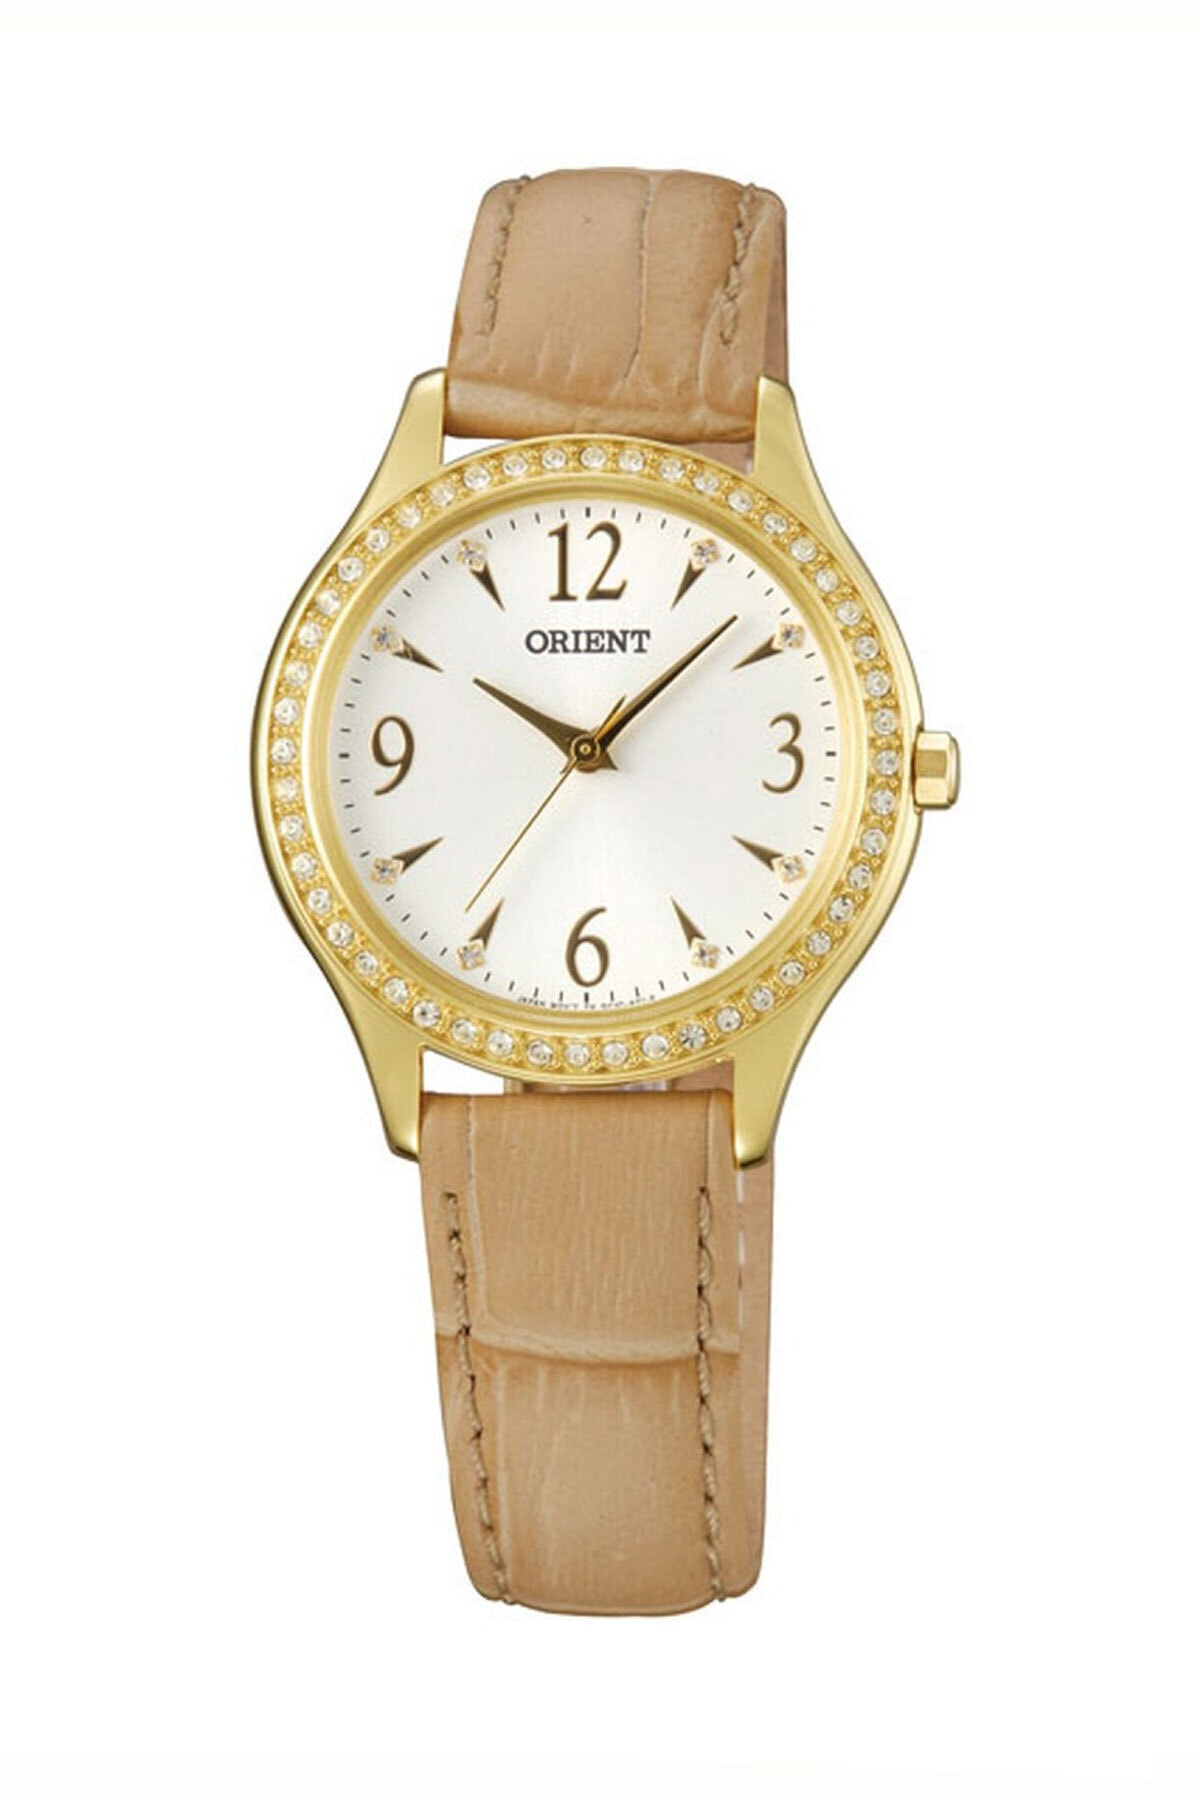 Orient Kadın Saati Fqc10006w0 Kehribar Tesbih 1